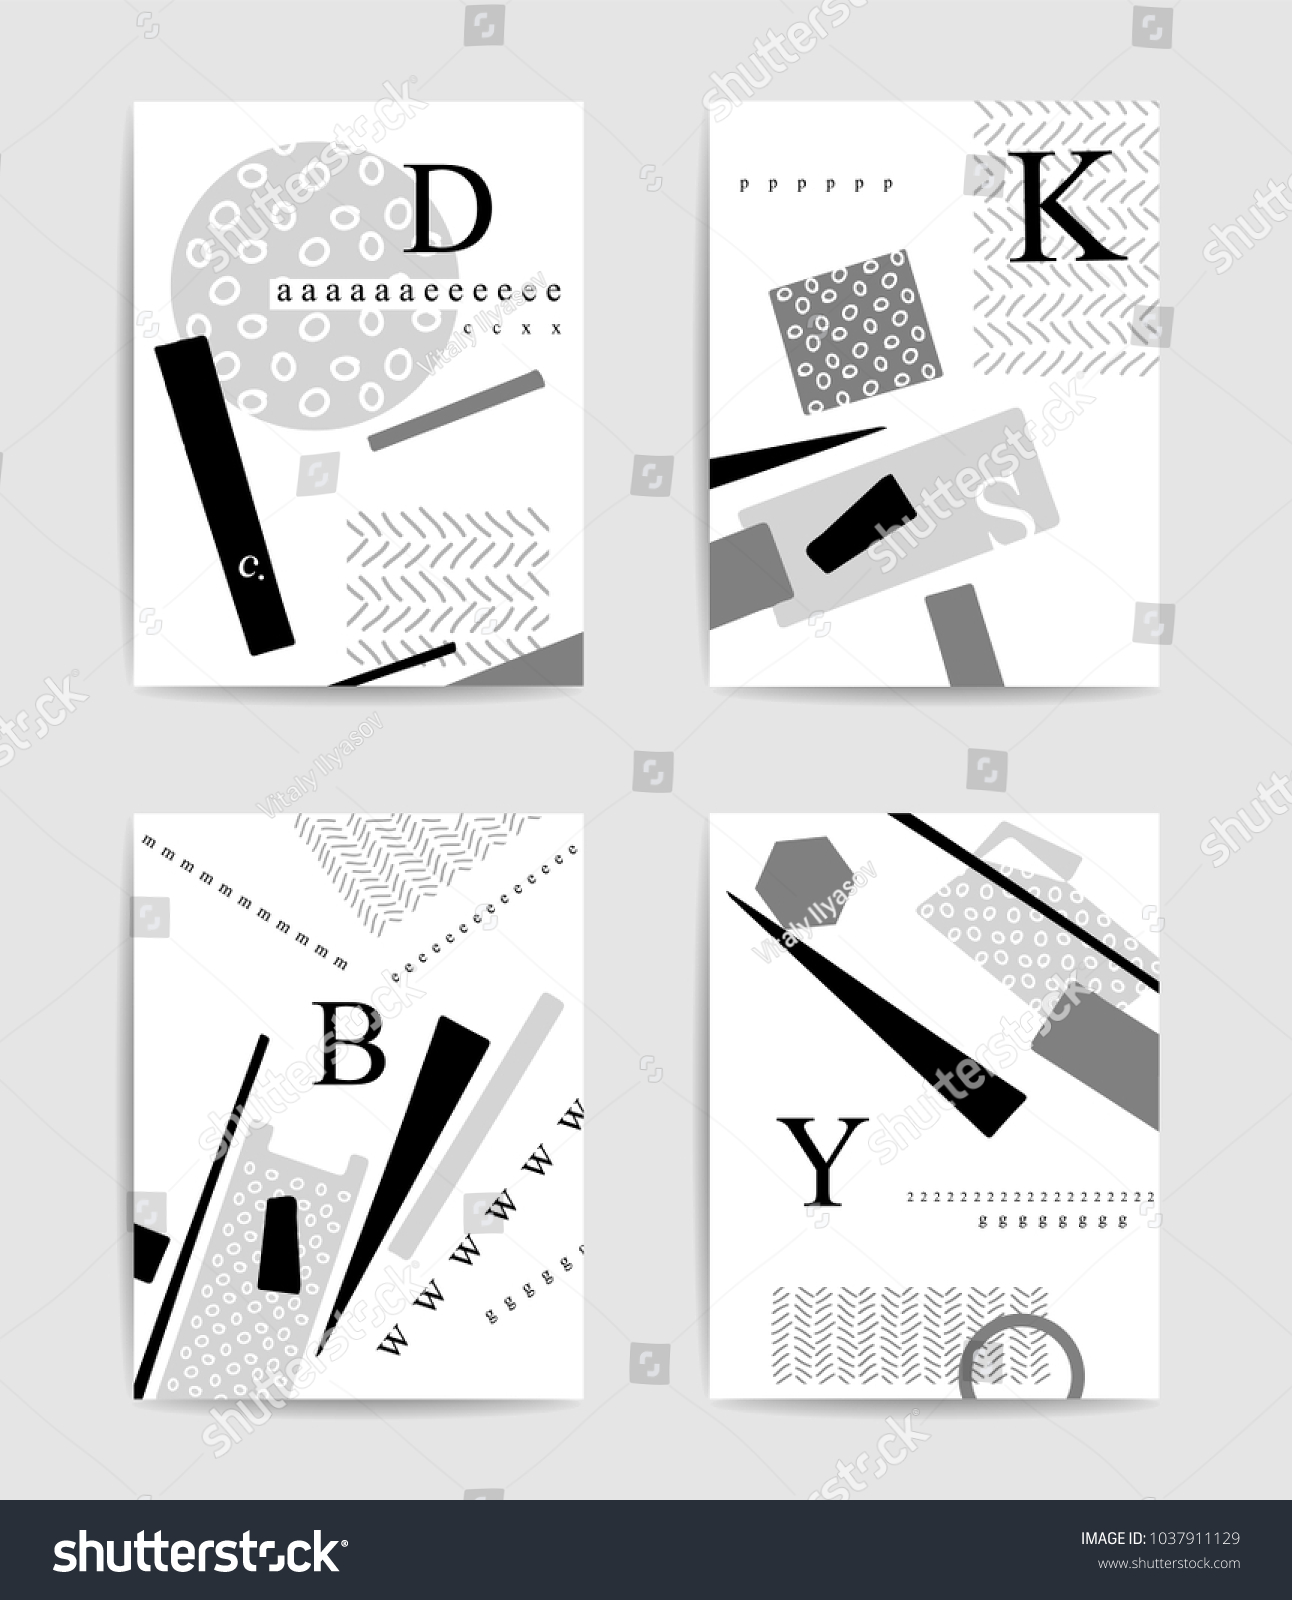 Grayscale Geometric Typography Template Set Design Stock Vector ...